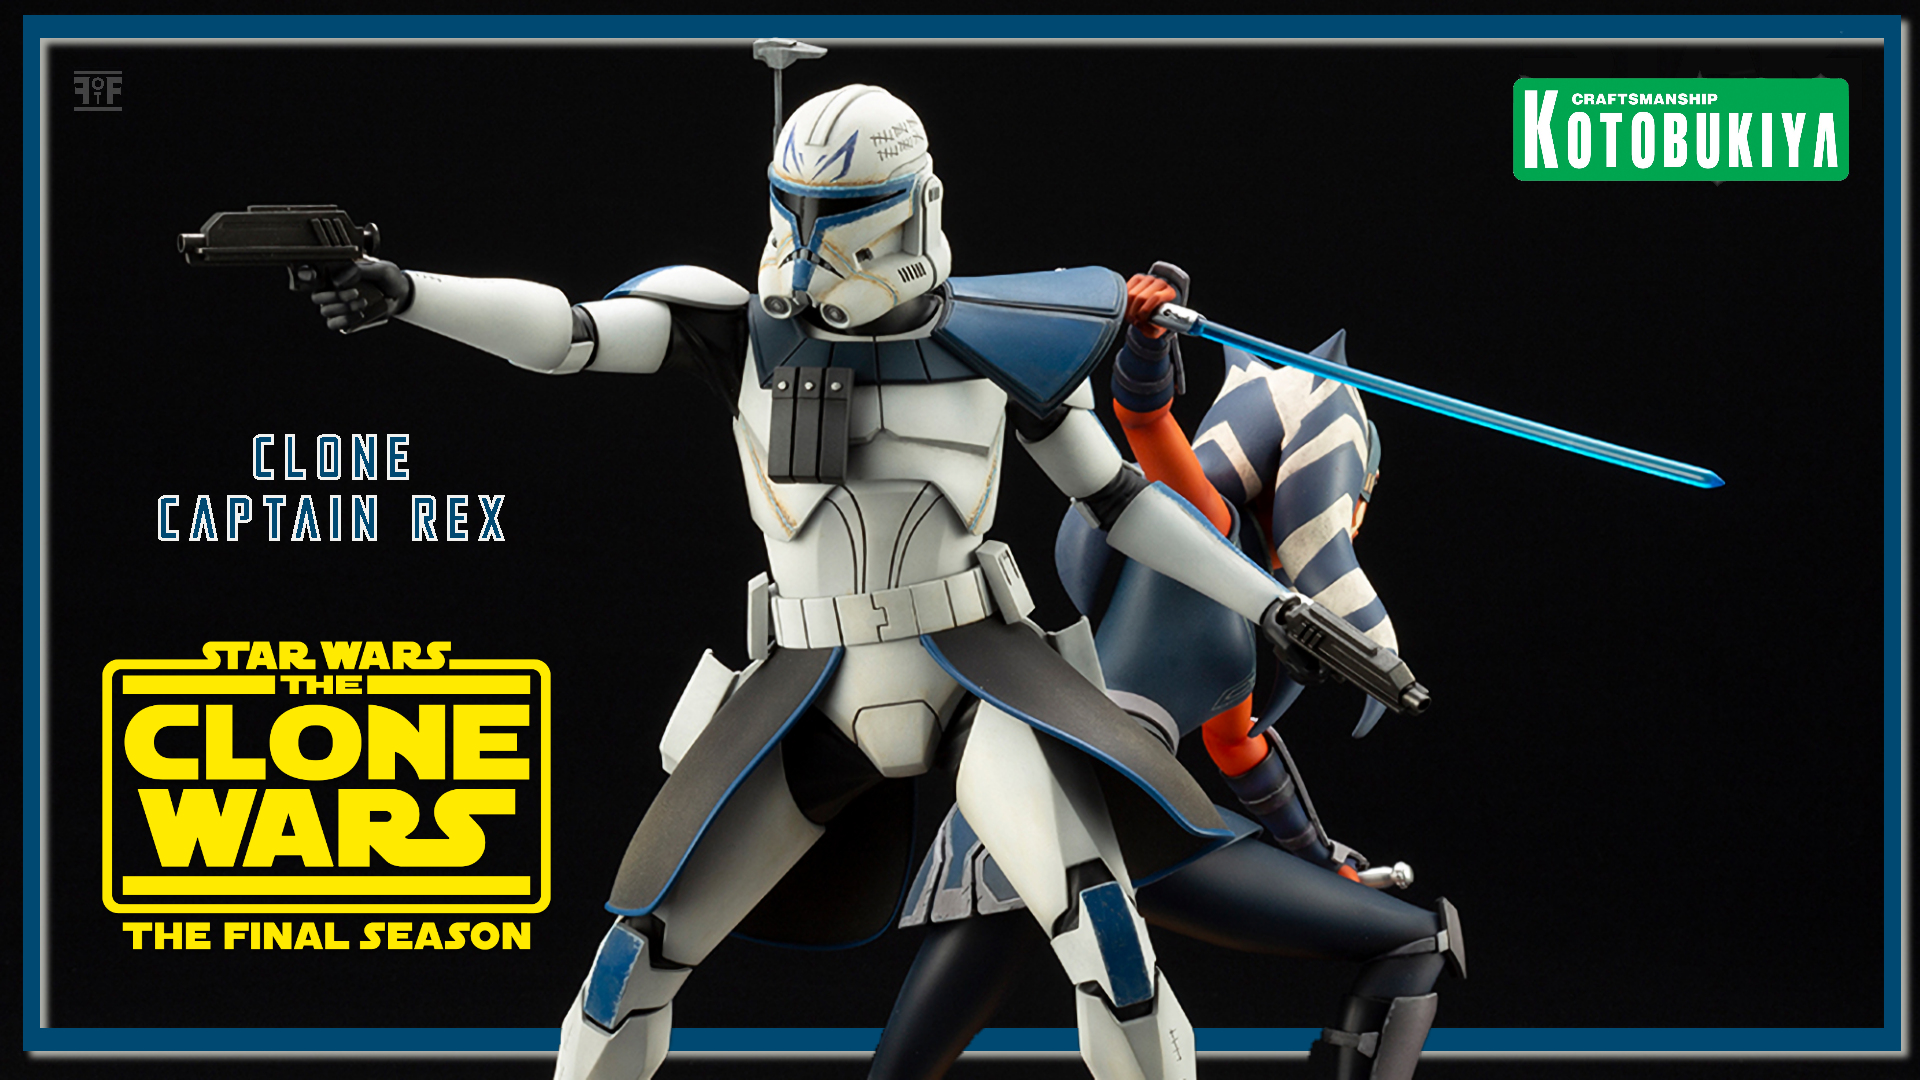 Star Wars: The Clone Wars Captain Rex Statue By Kotobukiya